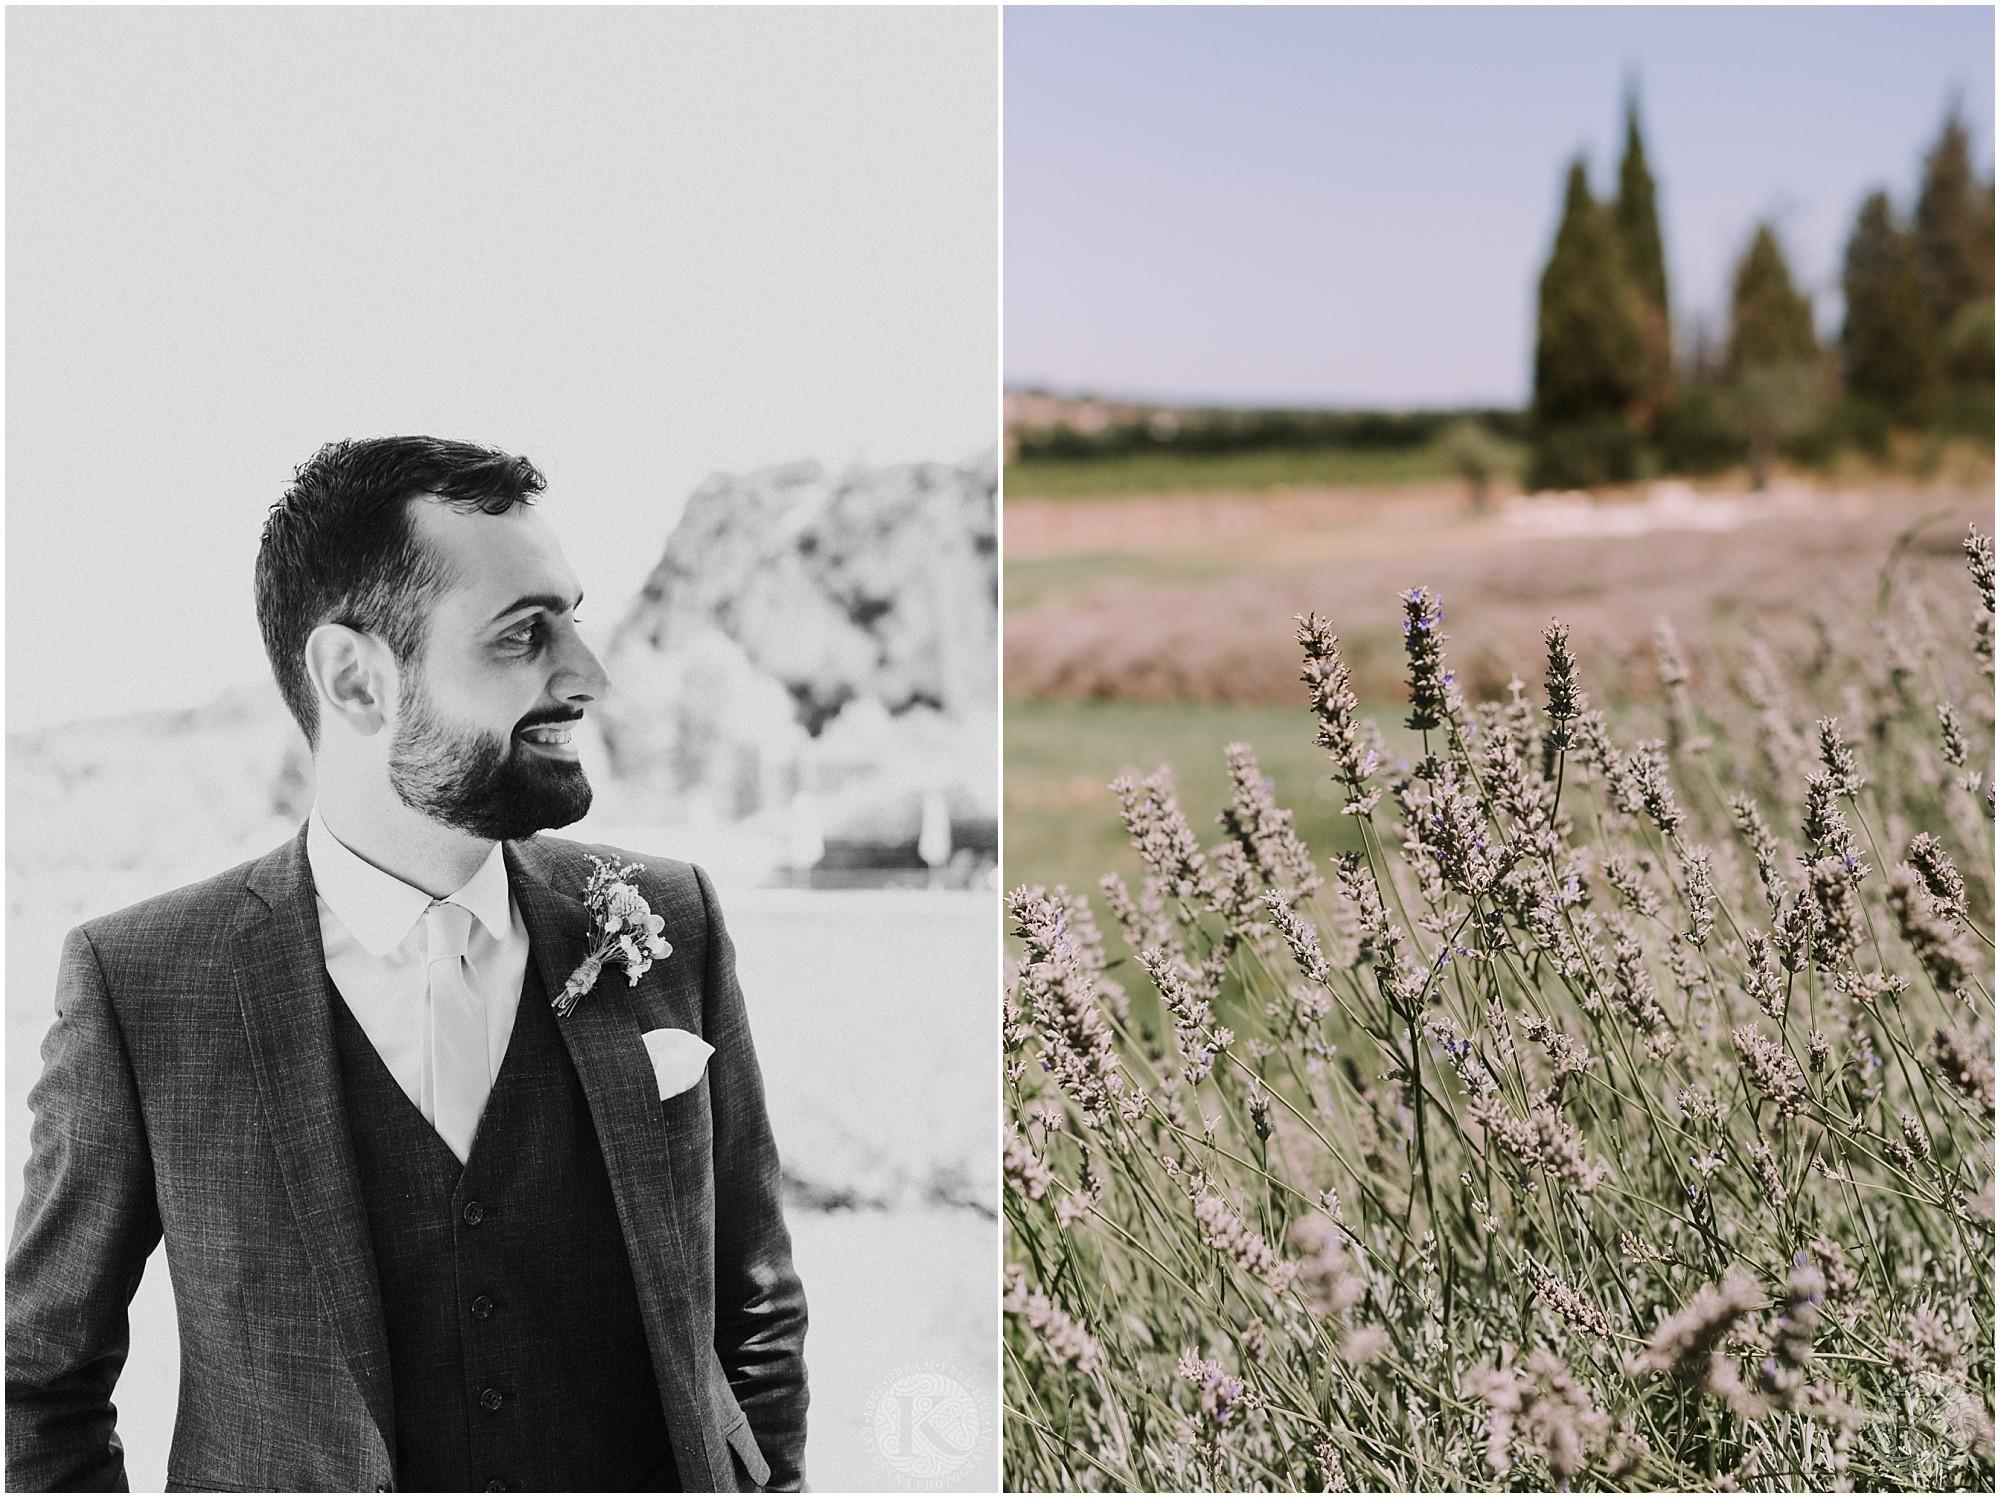 Kateryna-photos-photographe-mariage-vaucluse-provence-avignon-ferme-st-hugues_0006.jpg